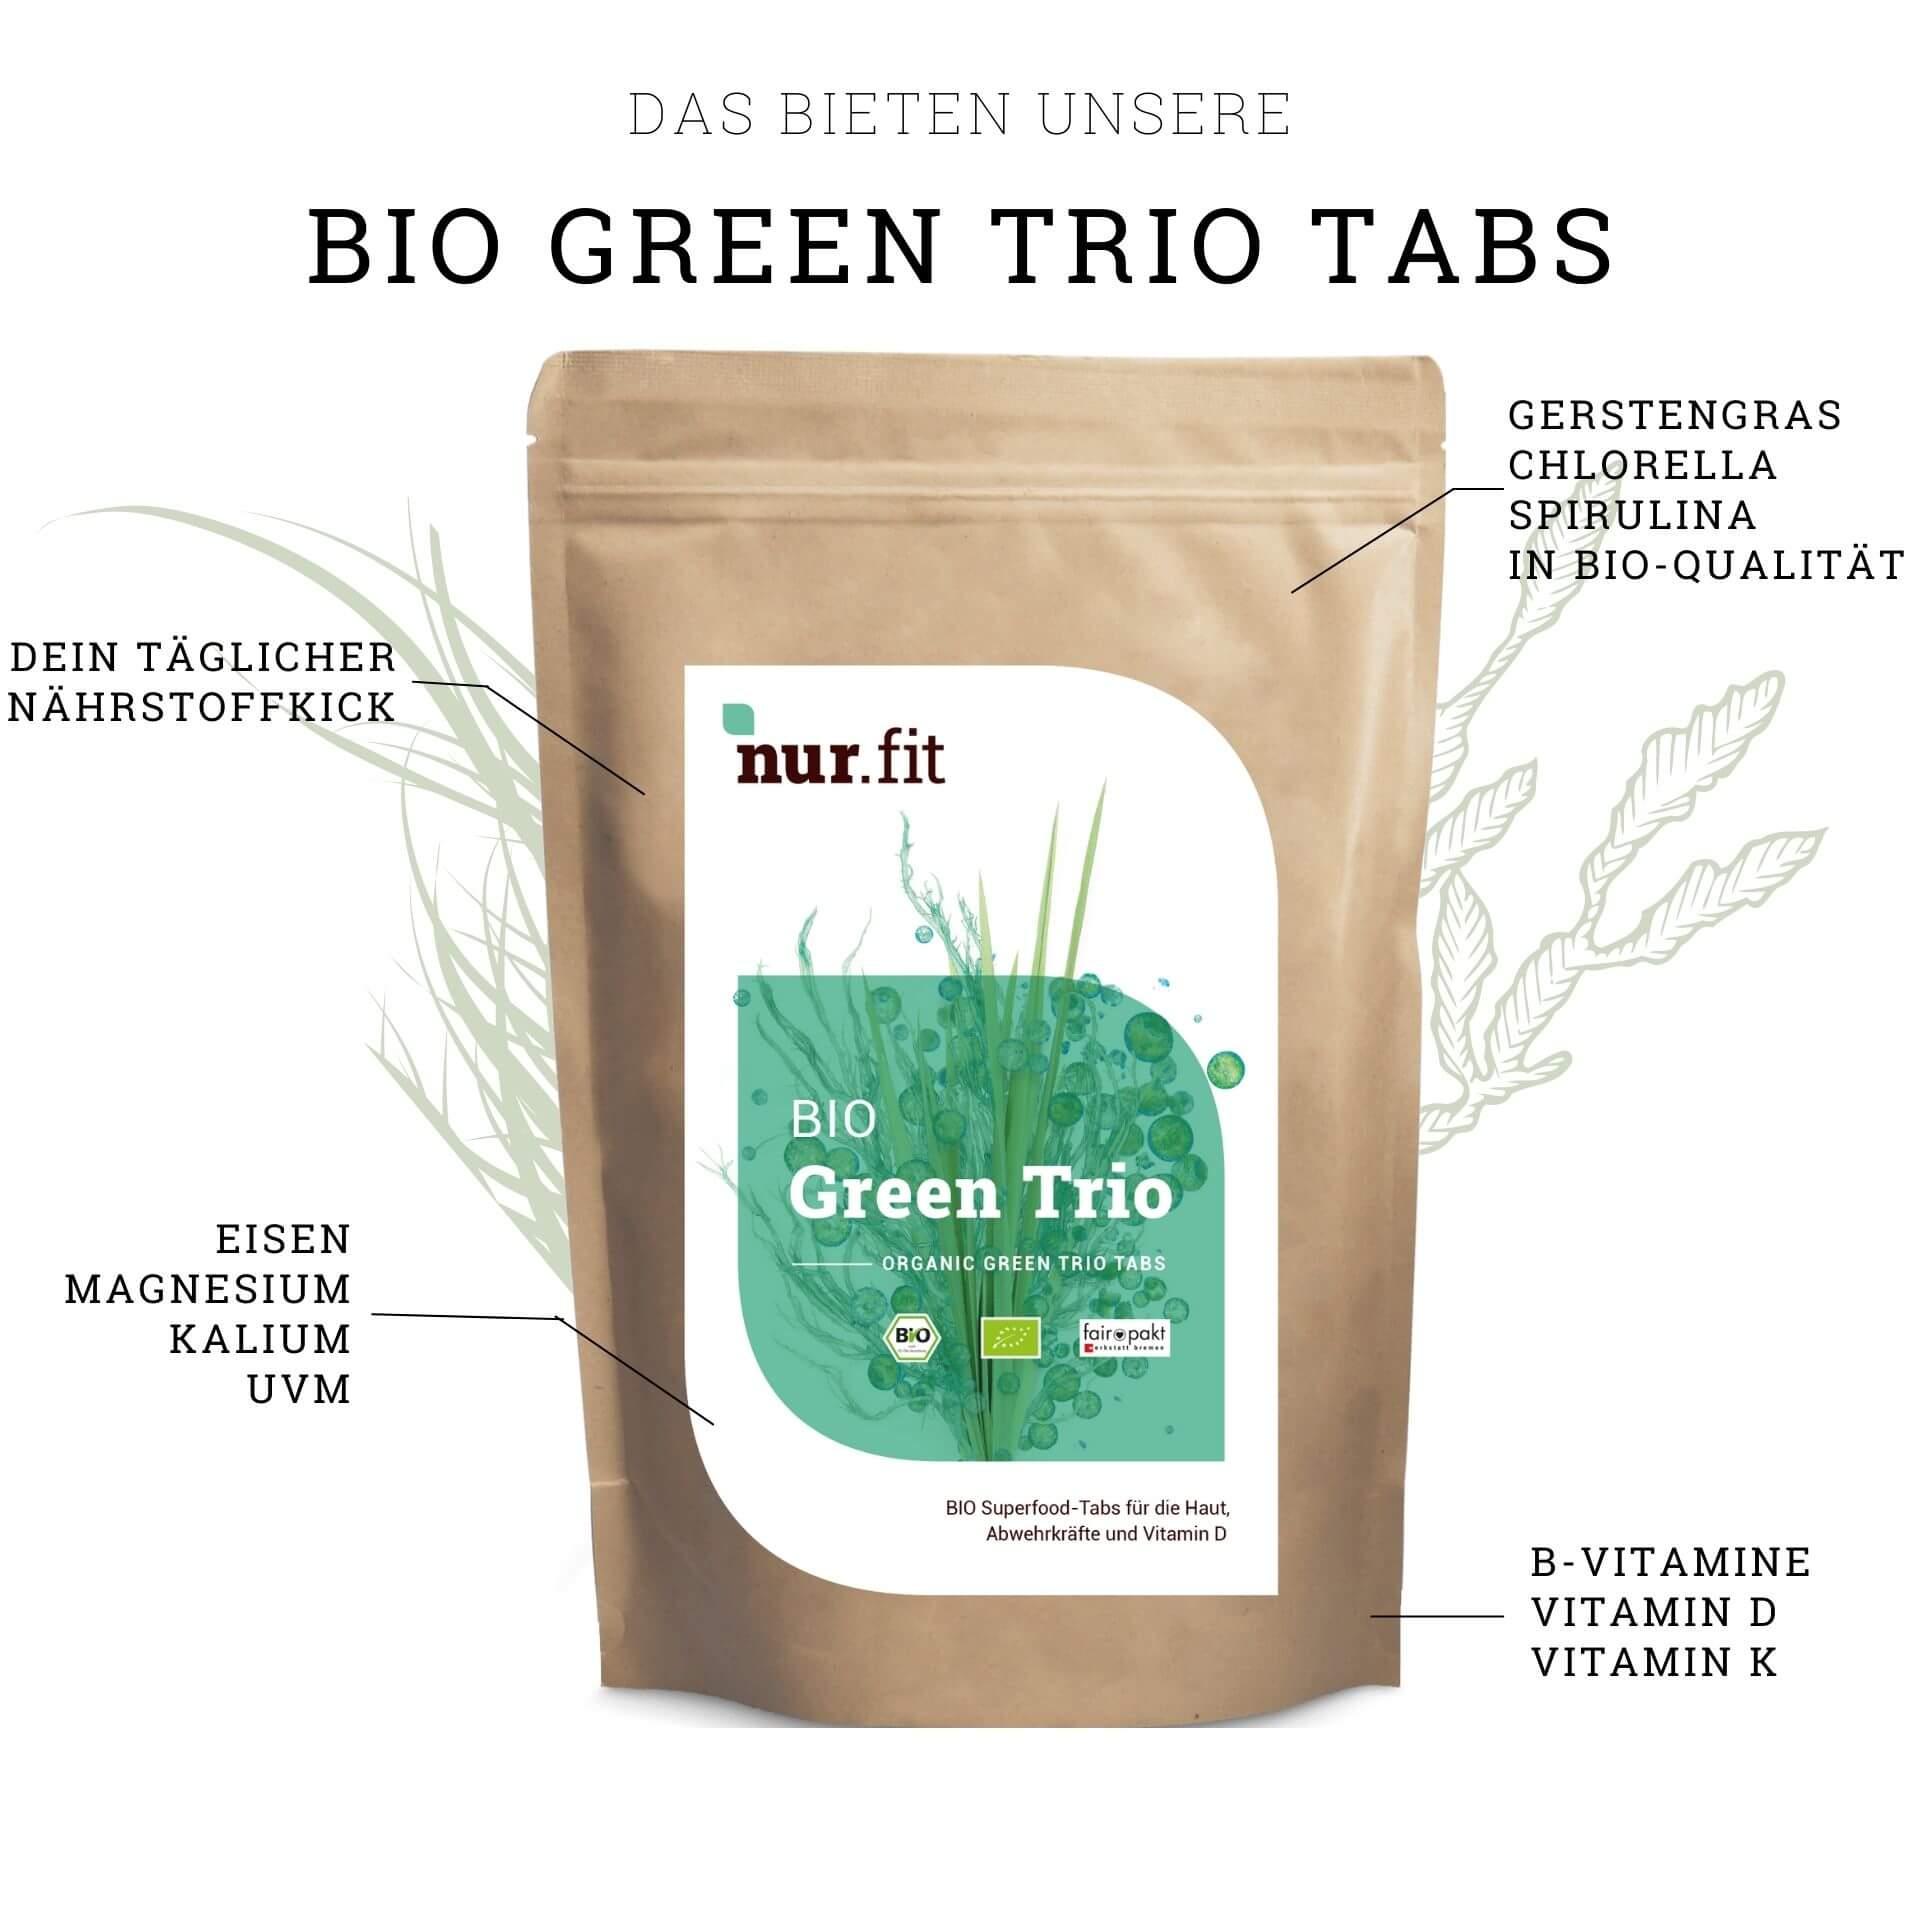 BIO Green Trio Tabs